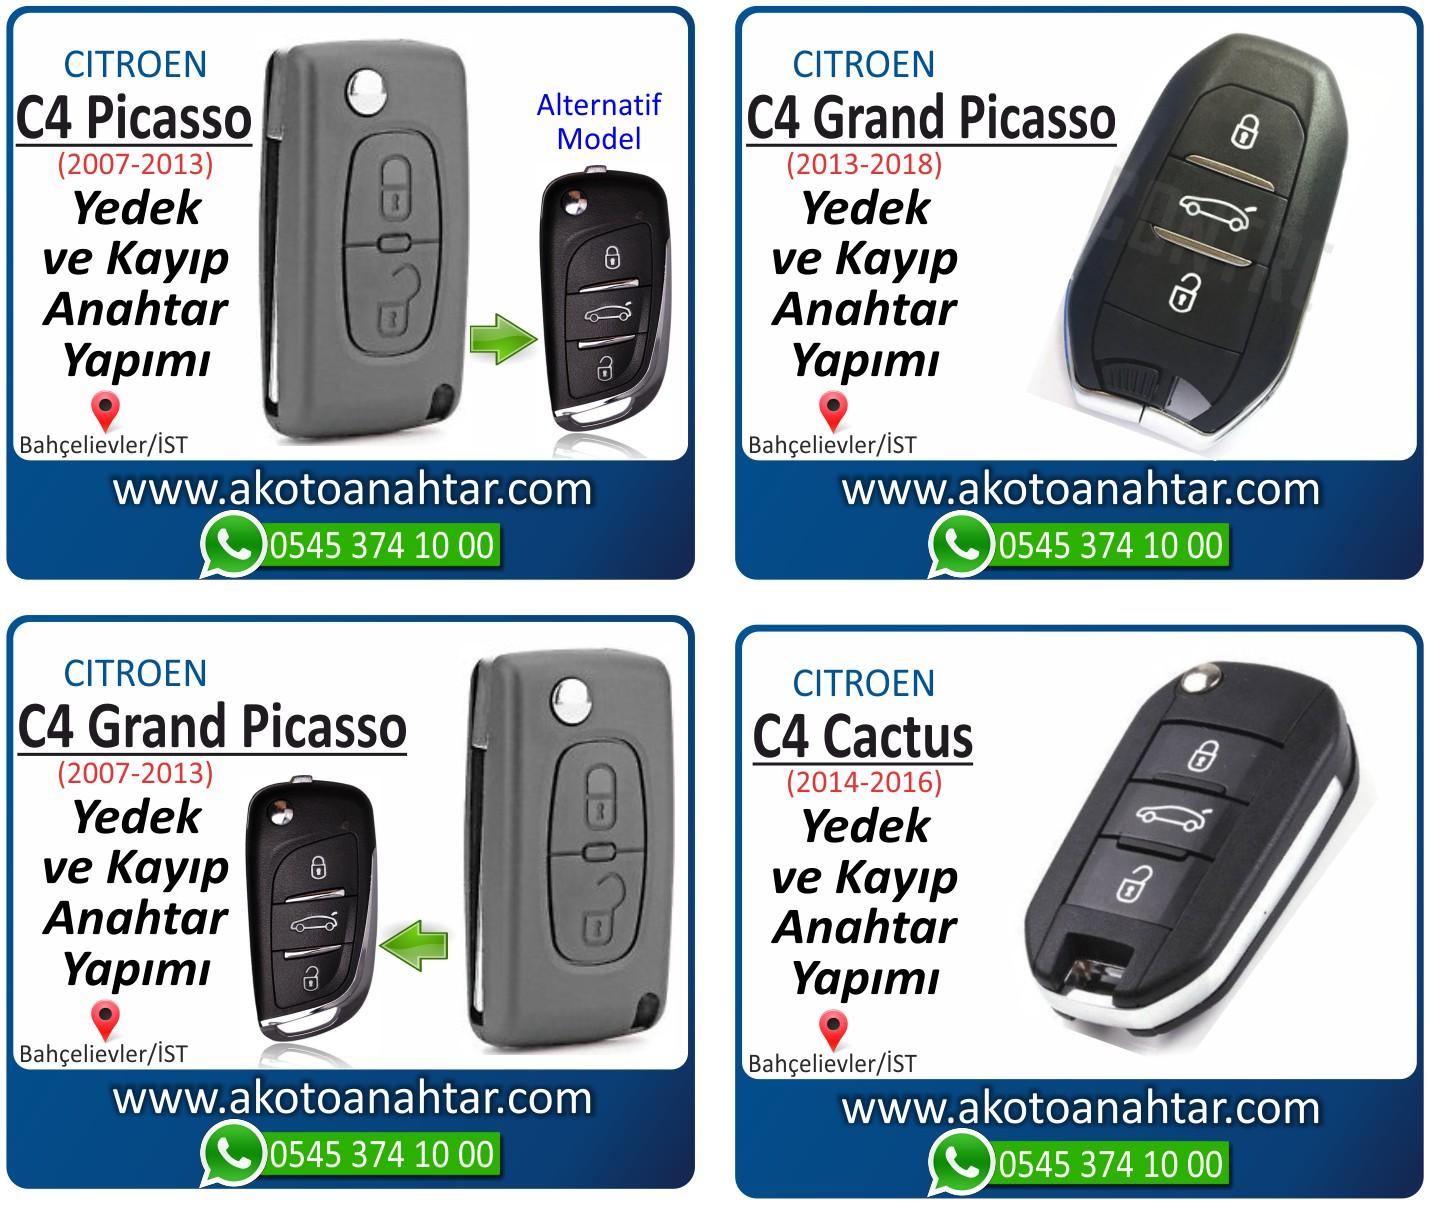 Citroen c4 c 4 grand picasso anahtari - Citroen C4 Grand Picasso Anahtarı | Yedek ve Kayıp Anahtar Yapımı